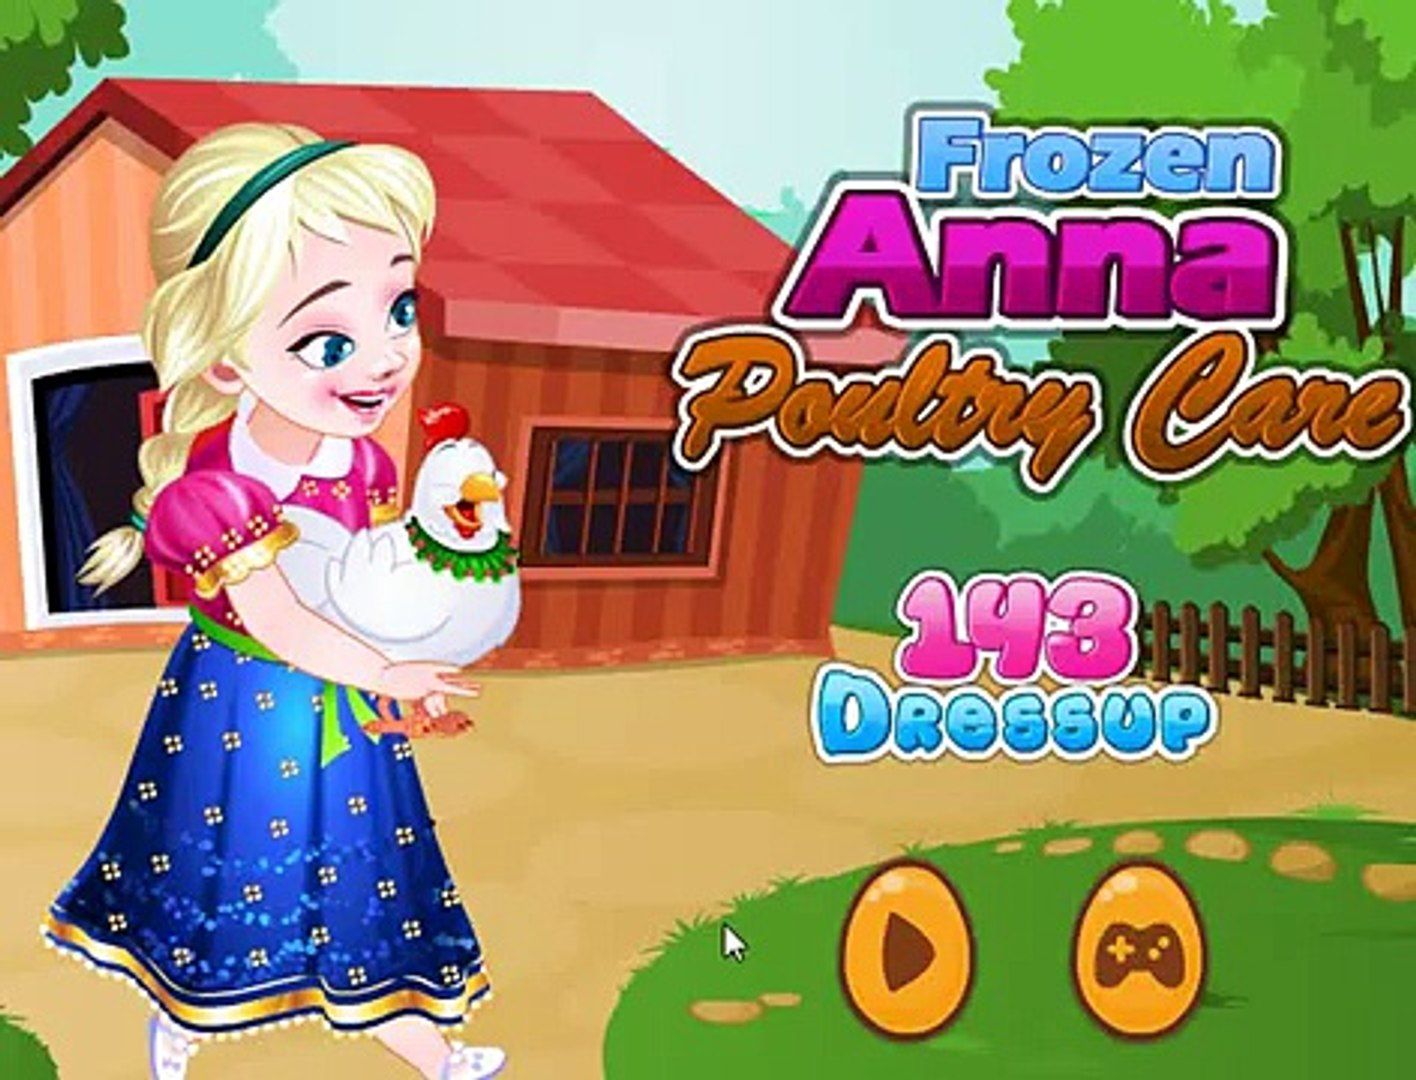 Холодное сердце: Анна на птицеферме ( Frozen Anna Poultry Care ) - Games for Kids